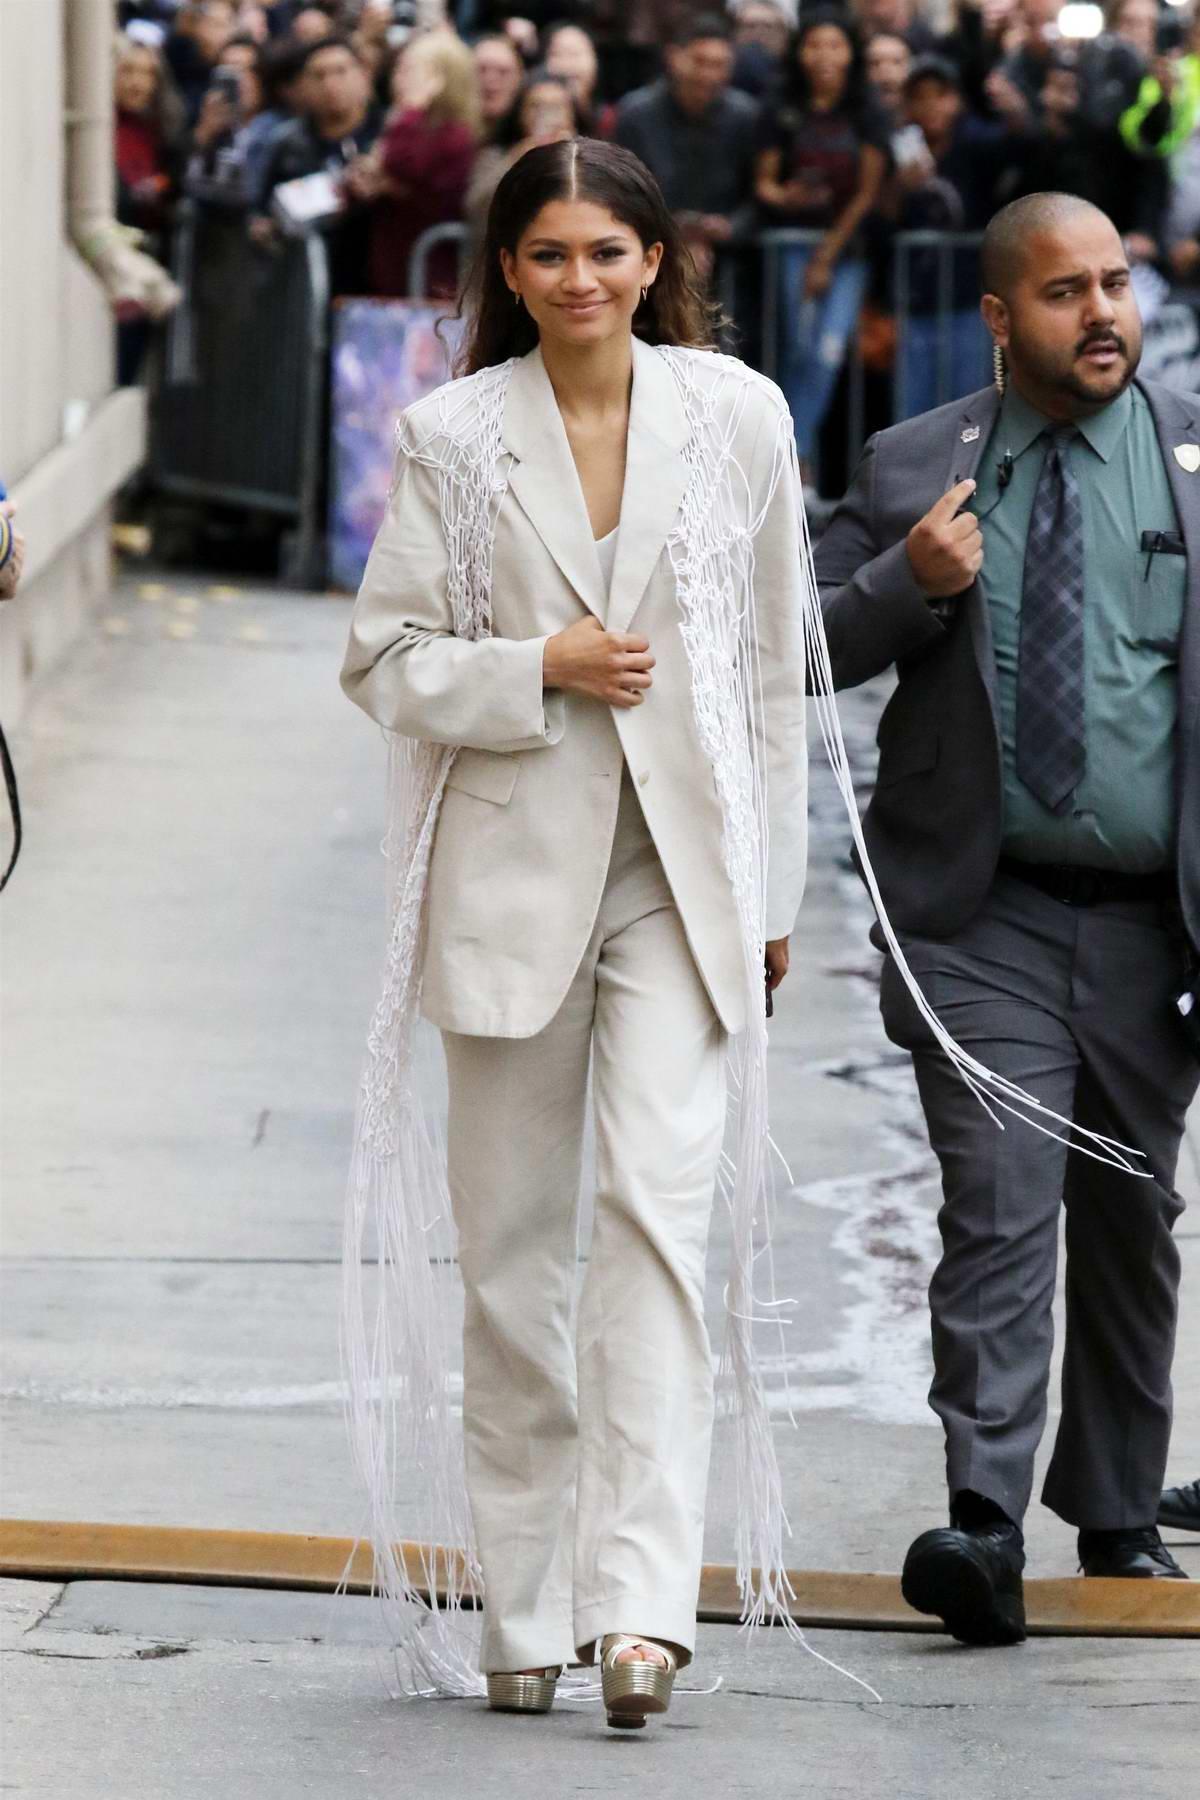 Zendaya greet fans as she leaves Jimmy Kimmel Live! in Hollywood, Los Angeles